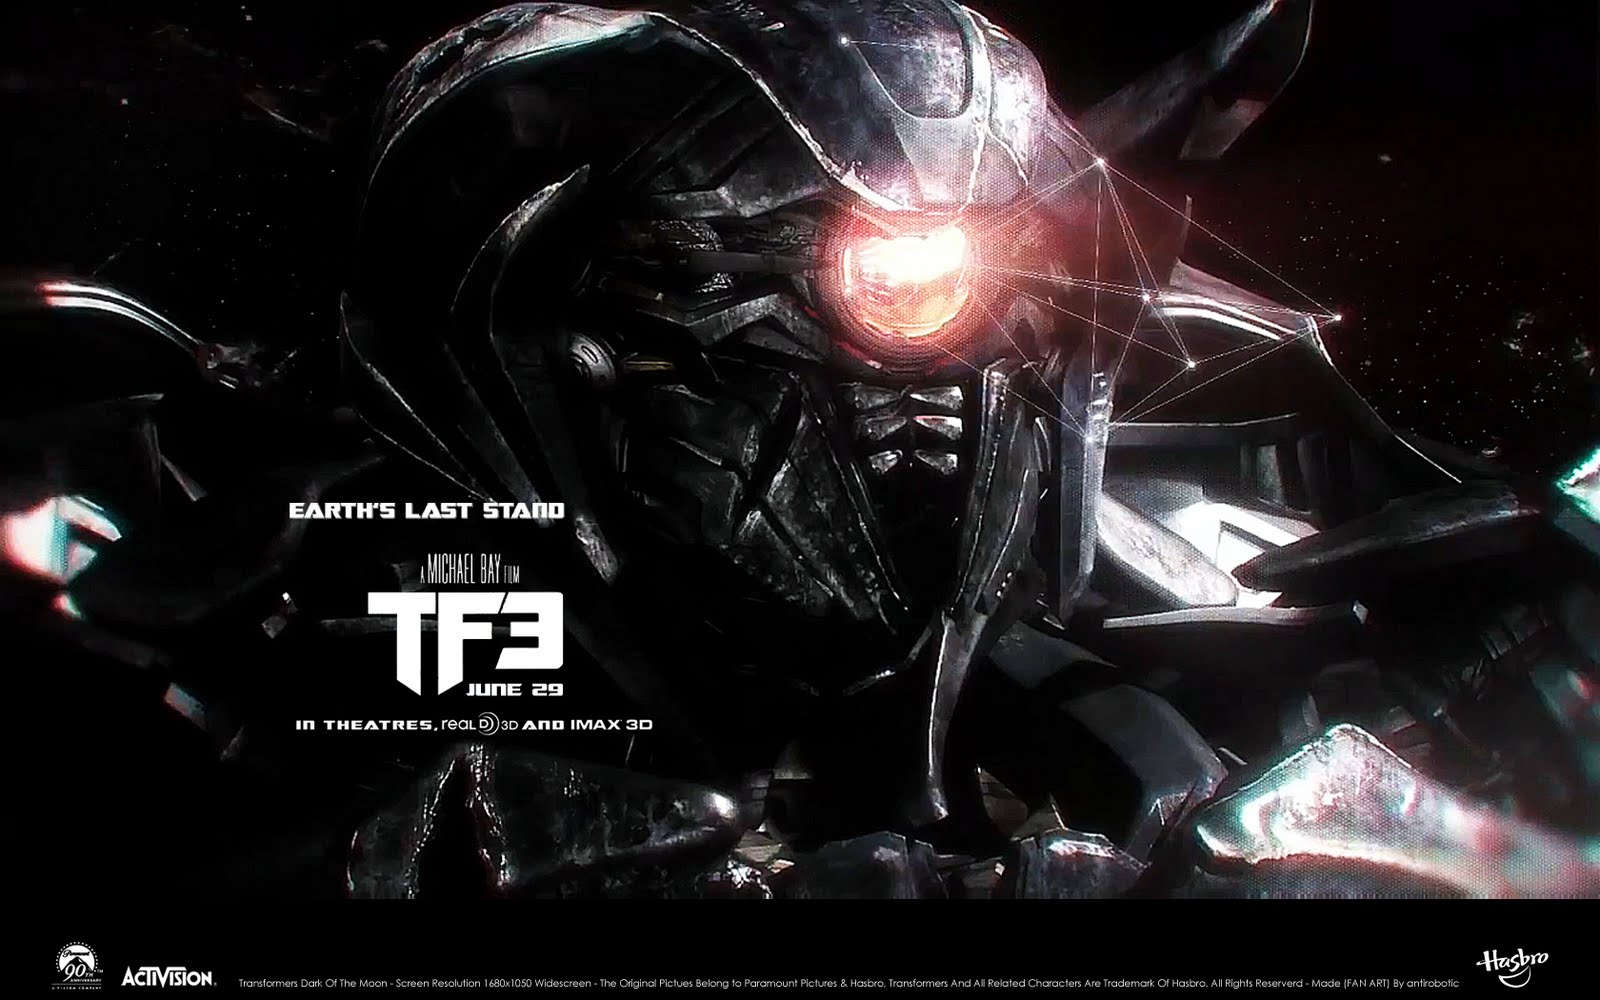 shockwave transformers dark of the moon wallpapers - Transformers Dark of the Moon Shockwave wallpaper